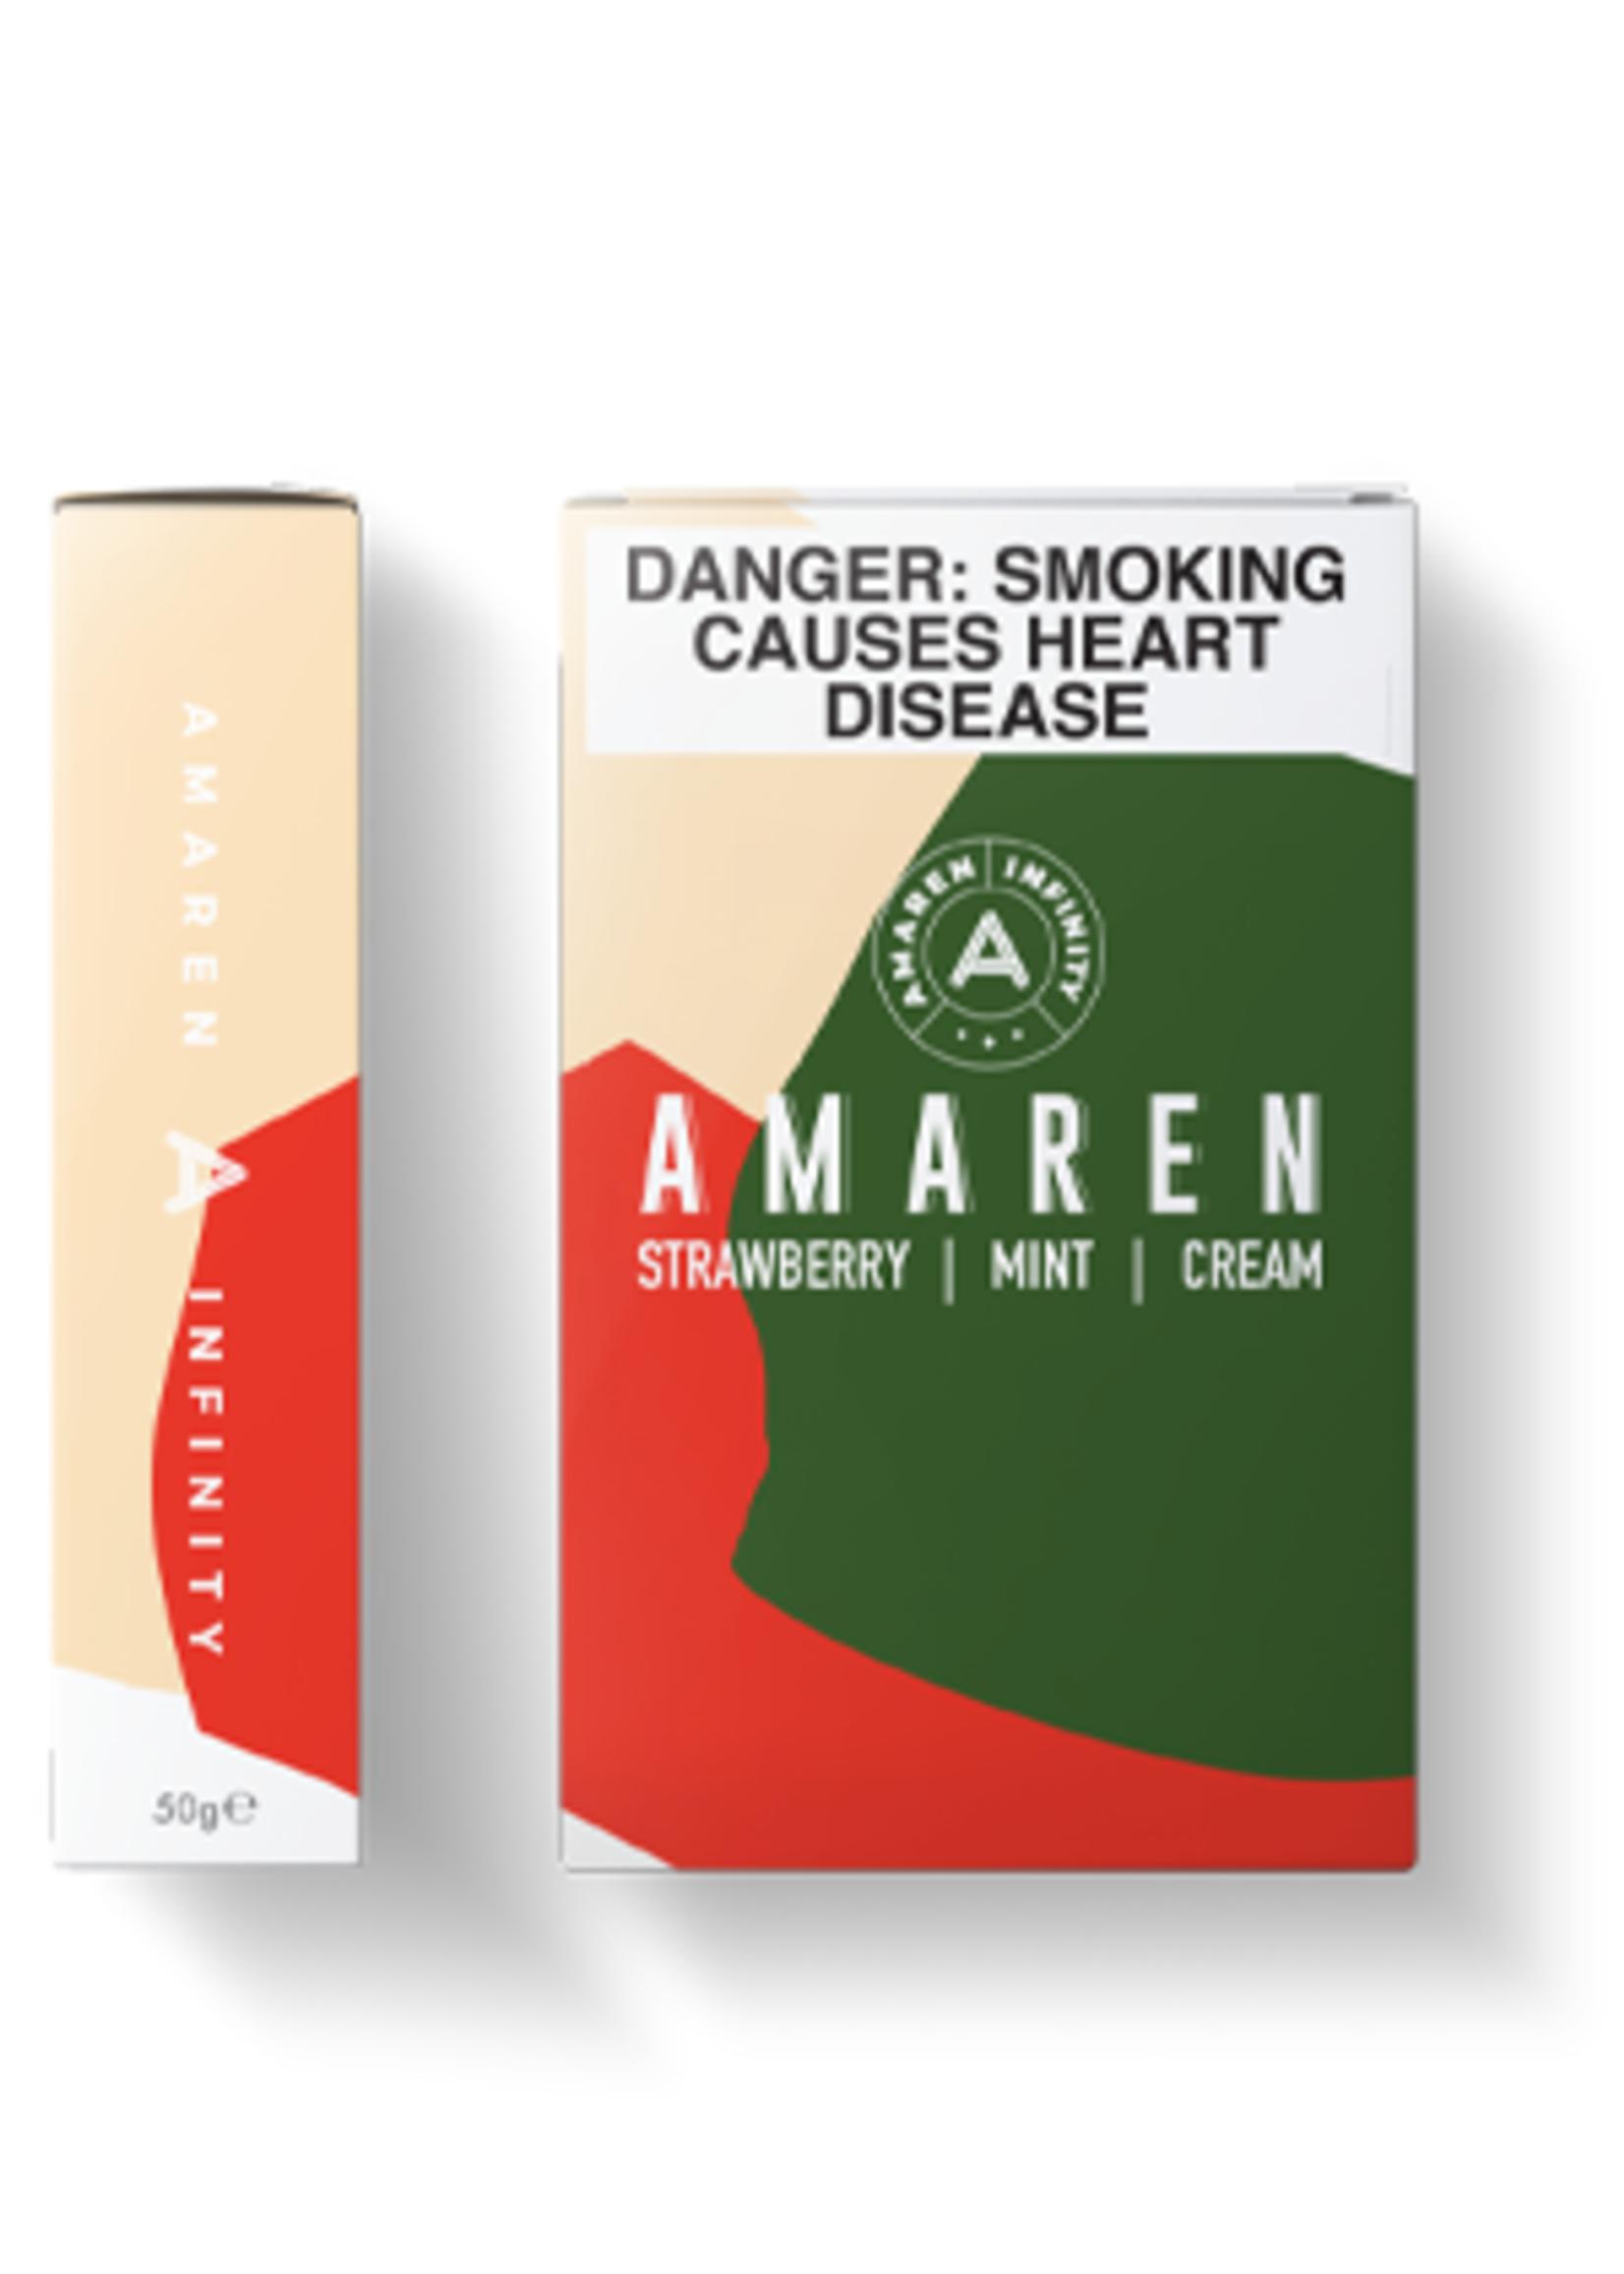 Amaren hubbly flavour - strawberry mint cream